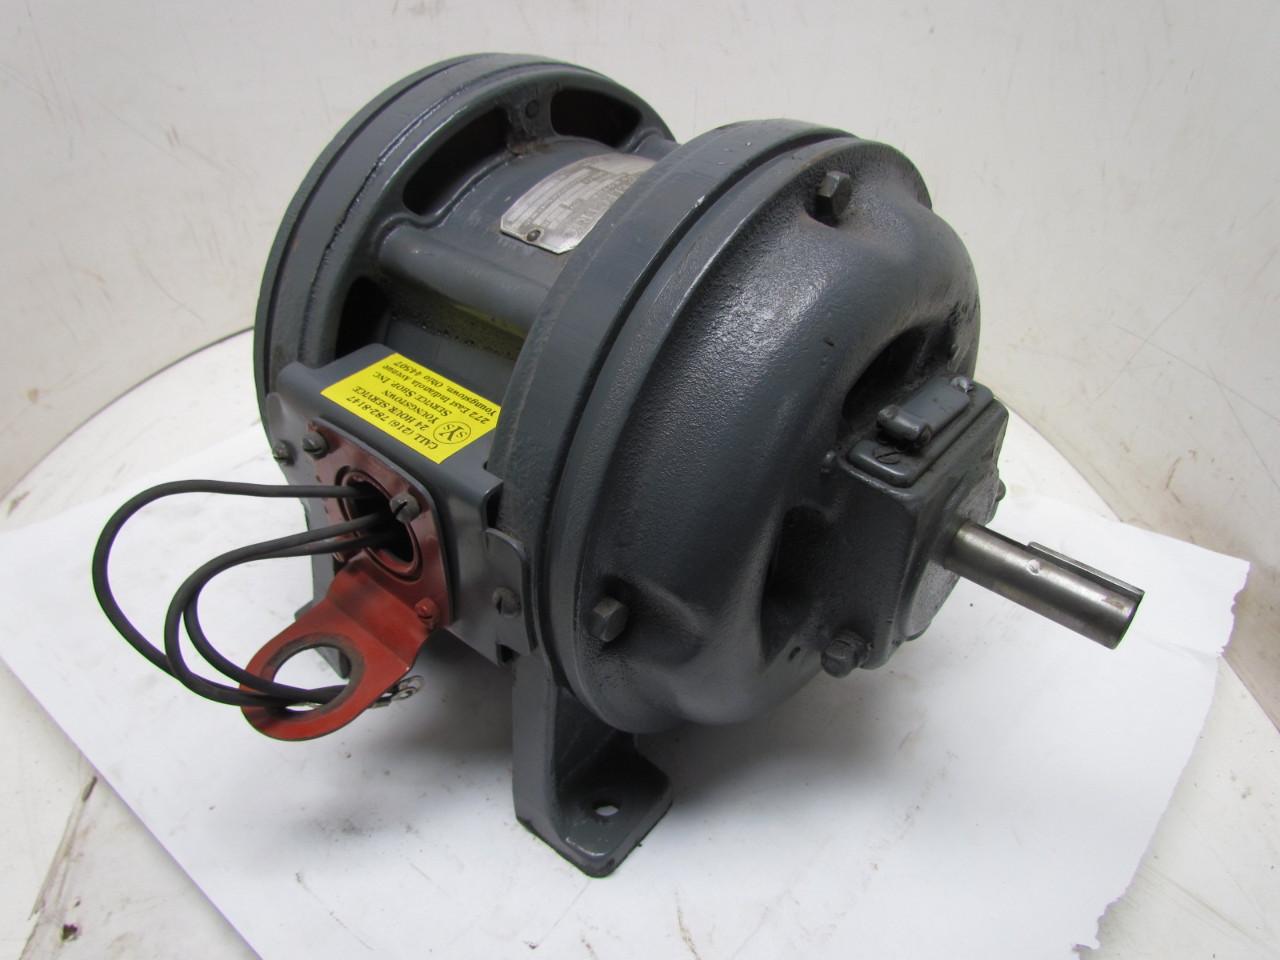 Ge general electric 3 phase 1hp 110v vintage motor 1720 for 3 phase 1hp electric motor